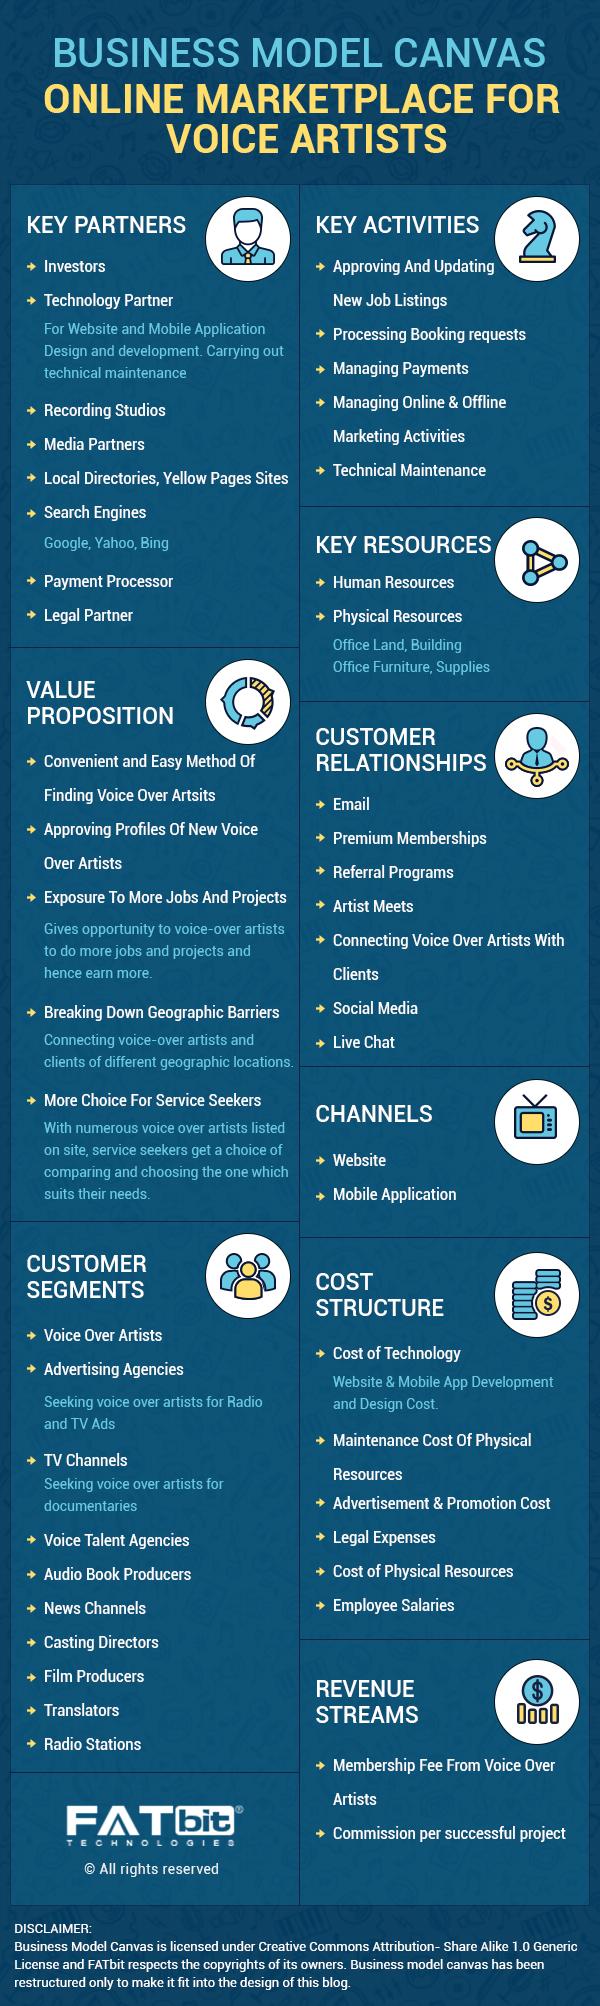 voice artist marketplace business model canvas